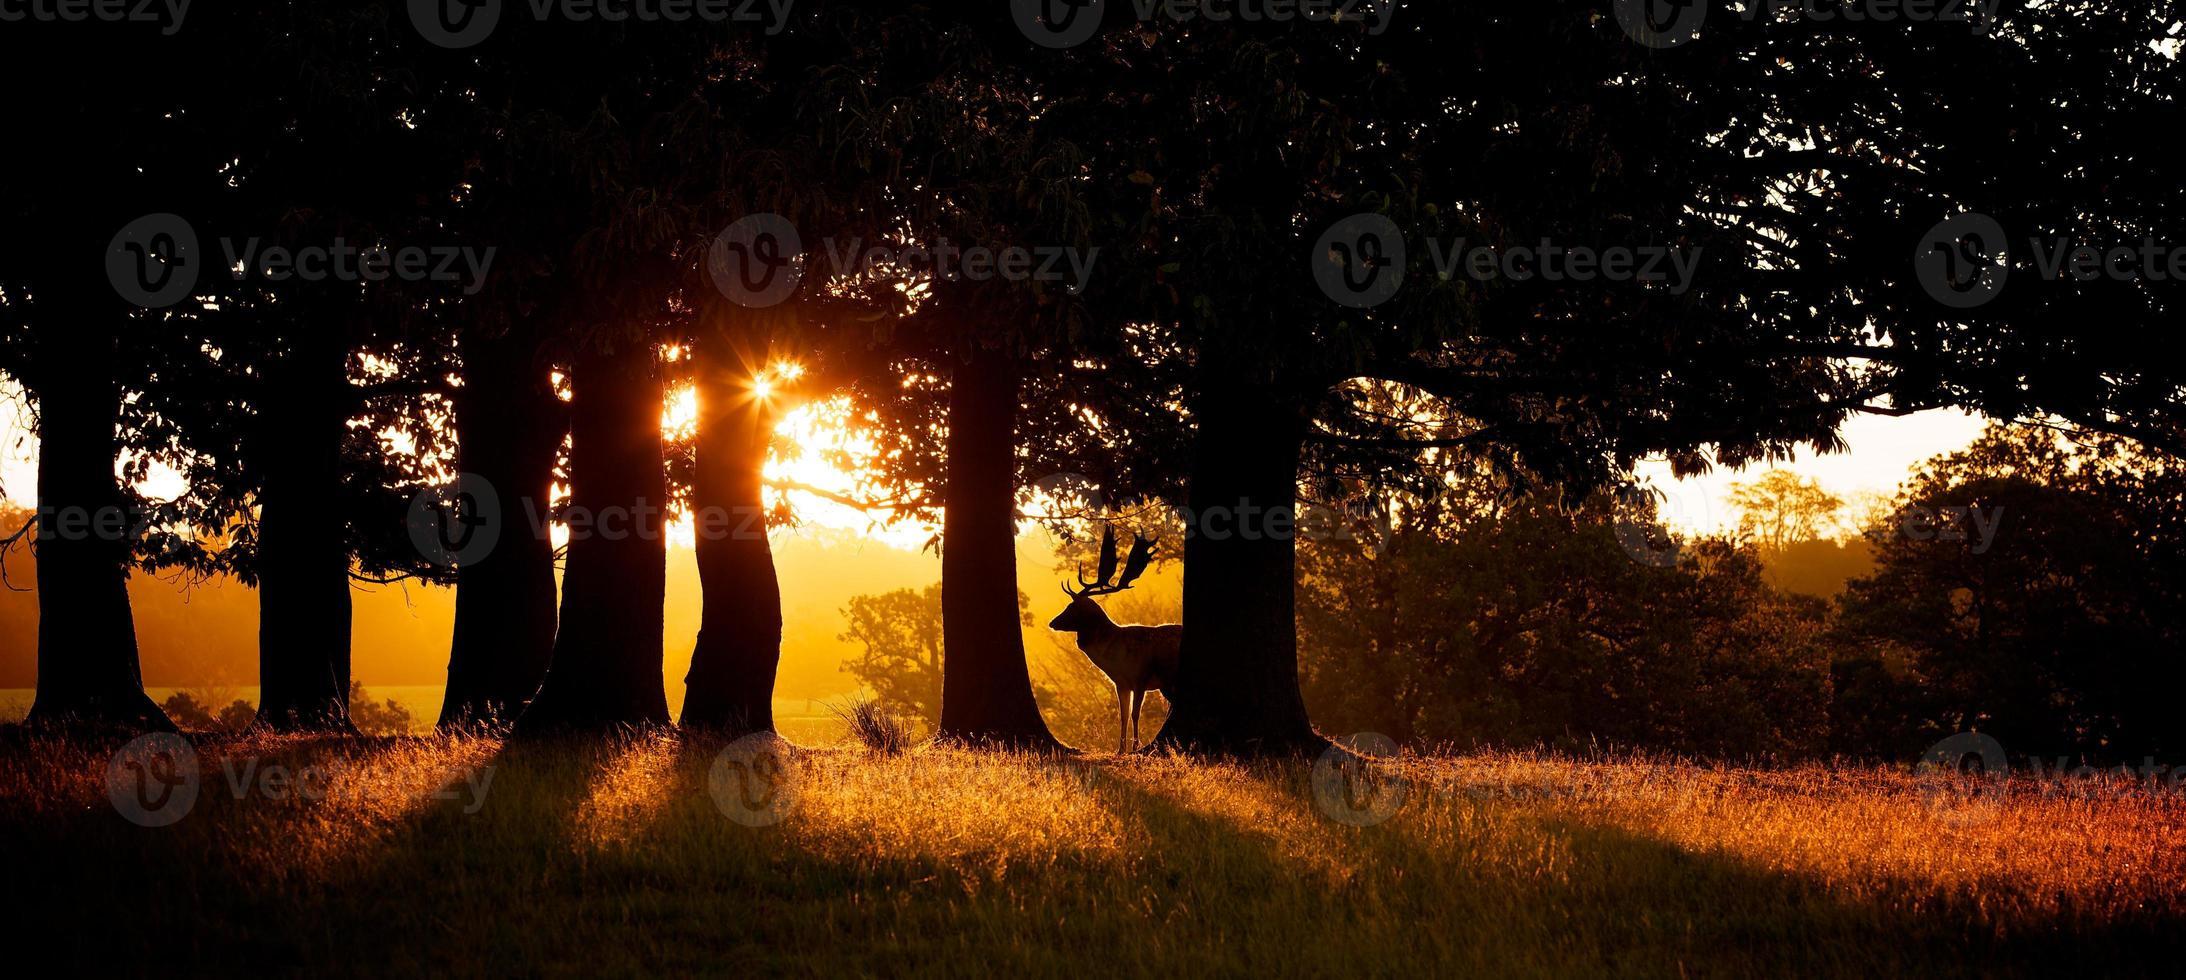 Sunrise silhouette photo